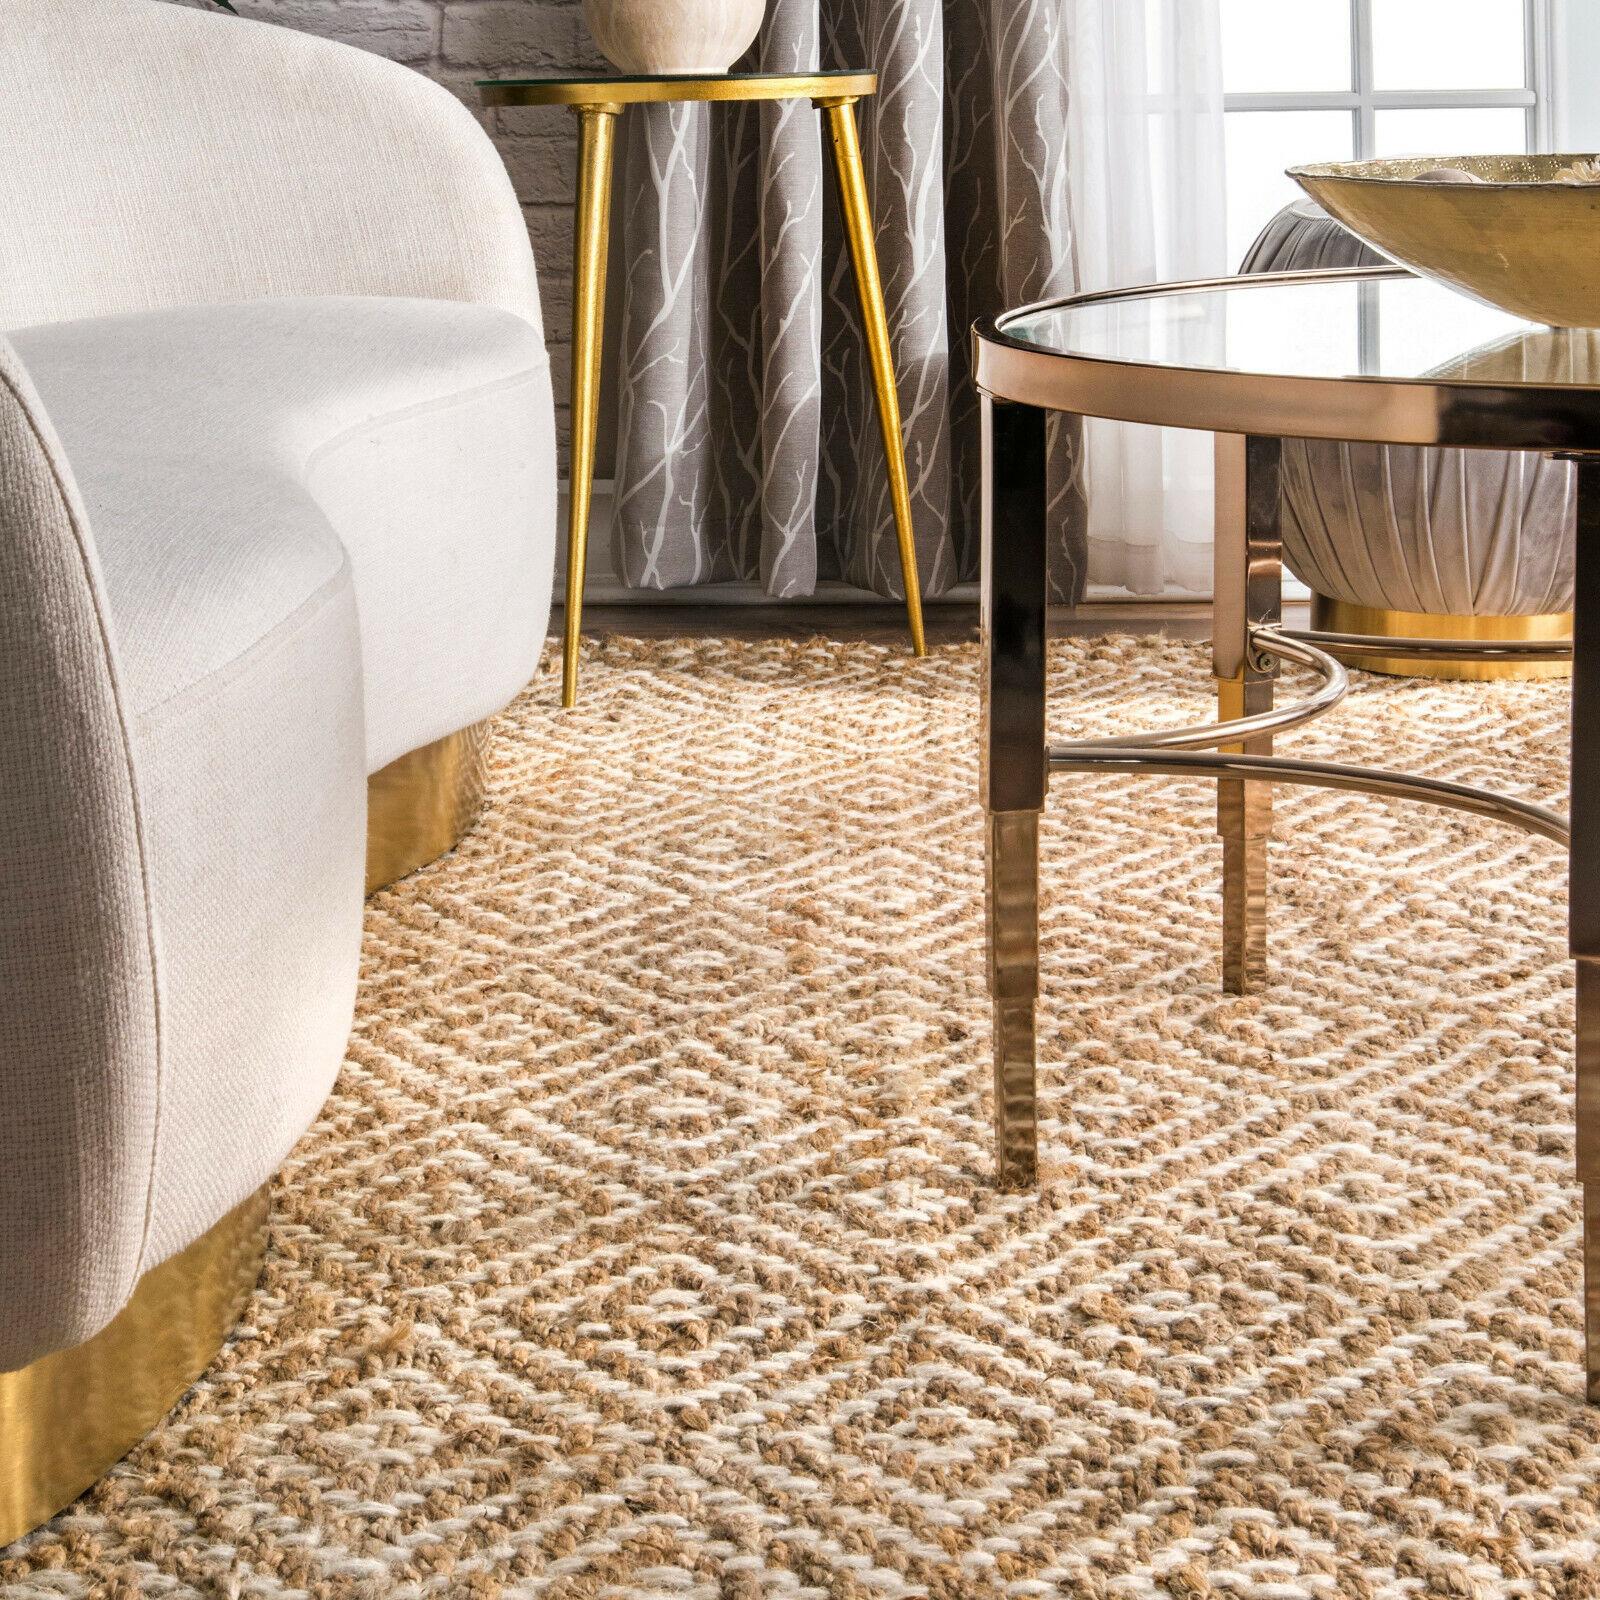 Braided Rug Indoor Outdoor Carpet Natural Fibres Geometric J